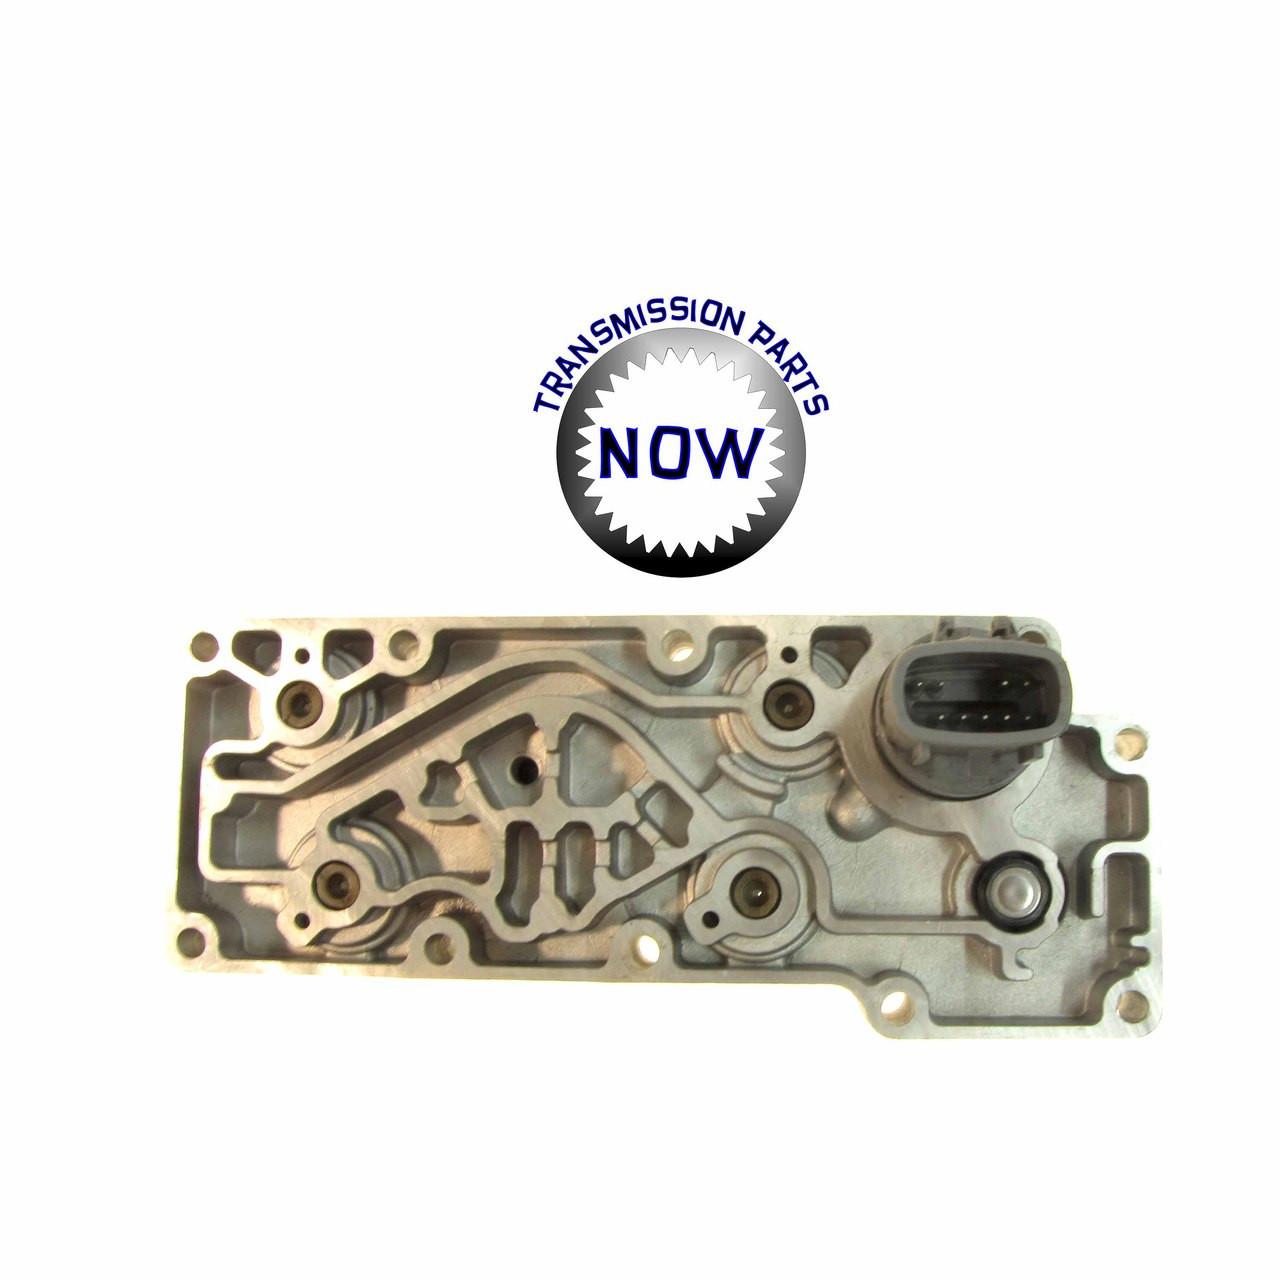 Ford E4OD solenoid block,  Buy at transpartsnow.com. E9TP-7G391-CA, R36420